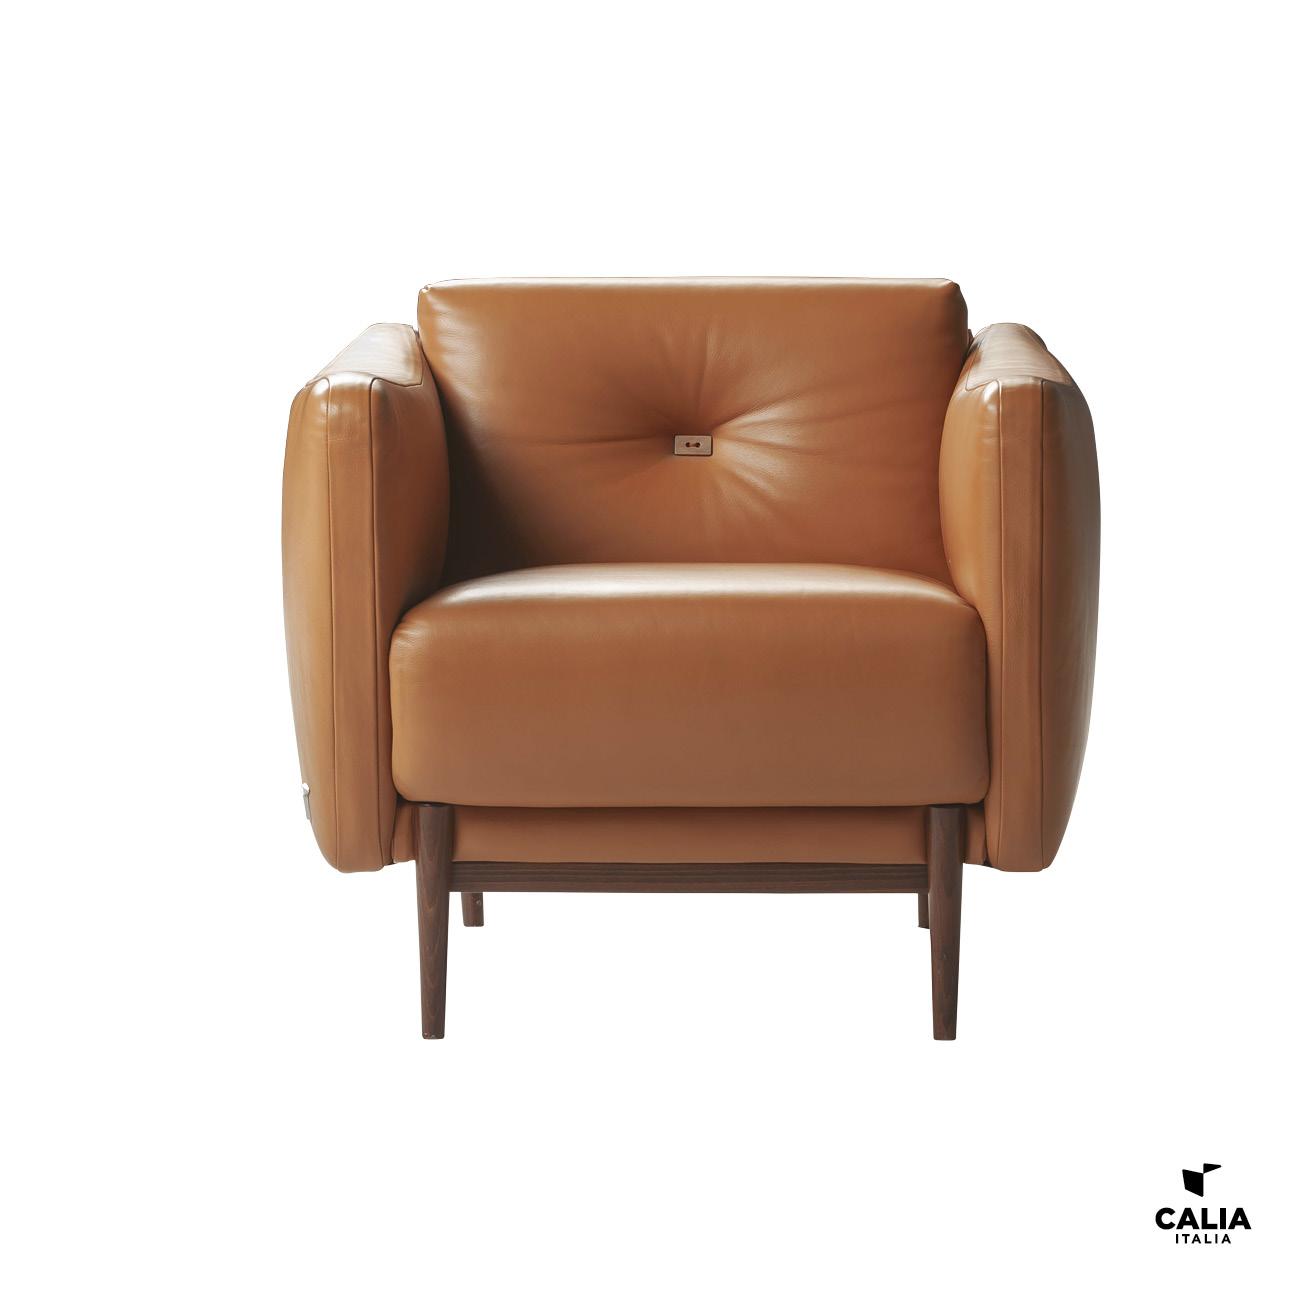 Caliaitalia - Poli